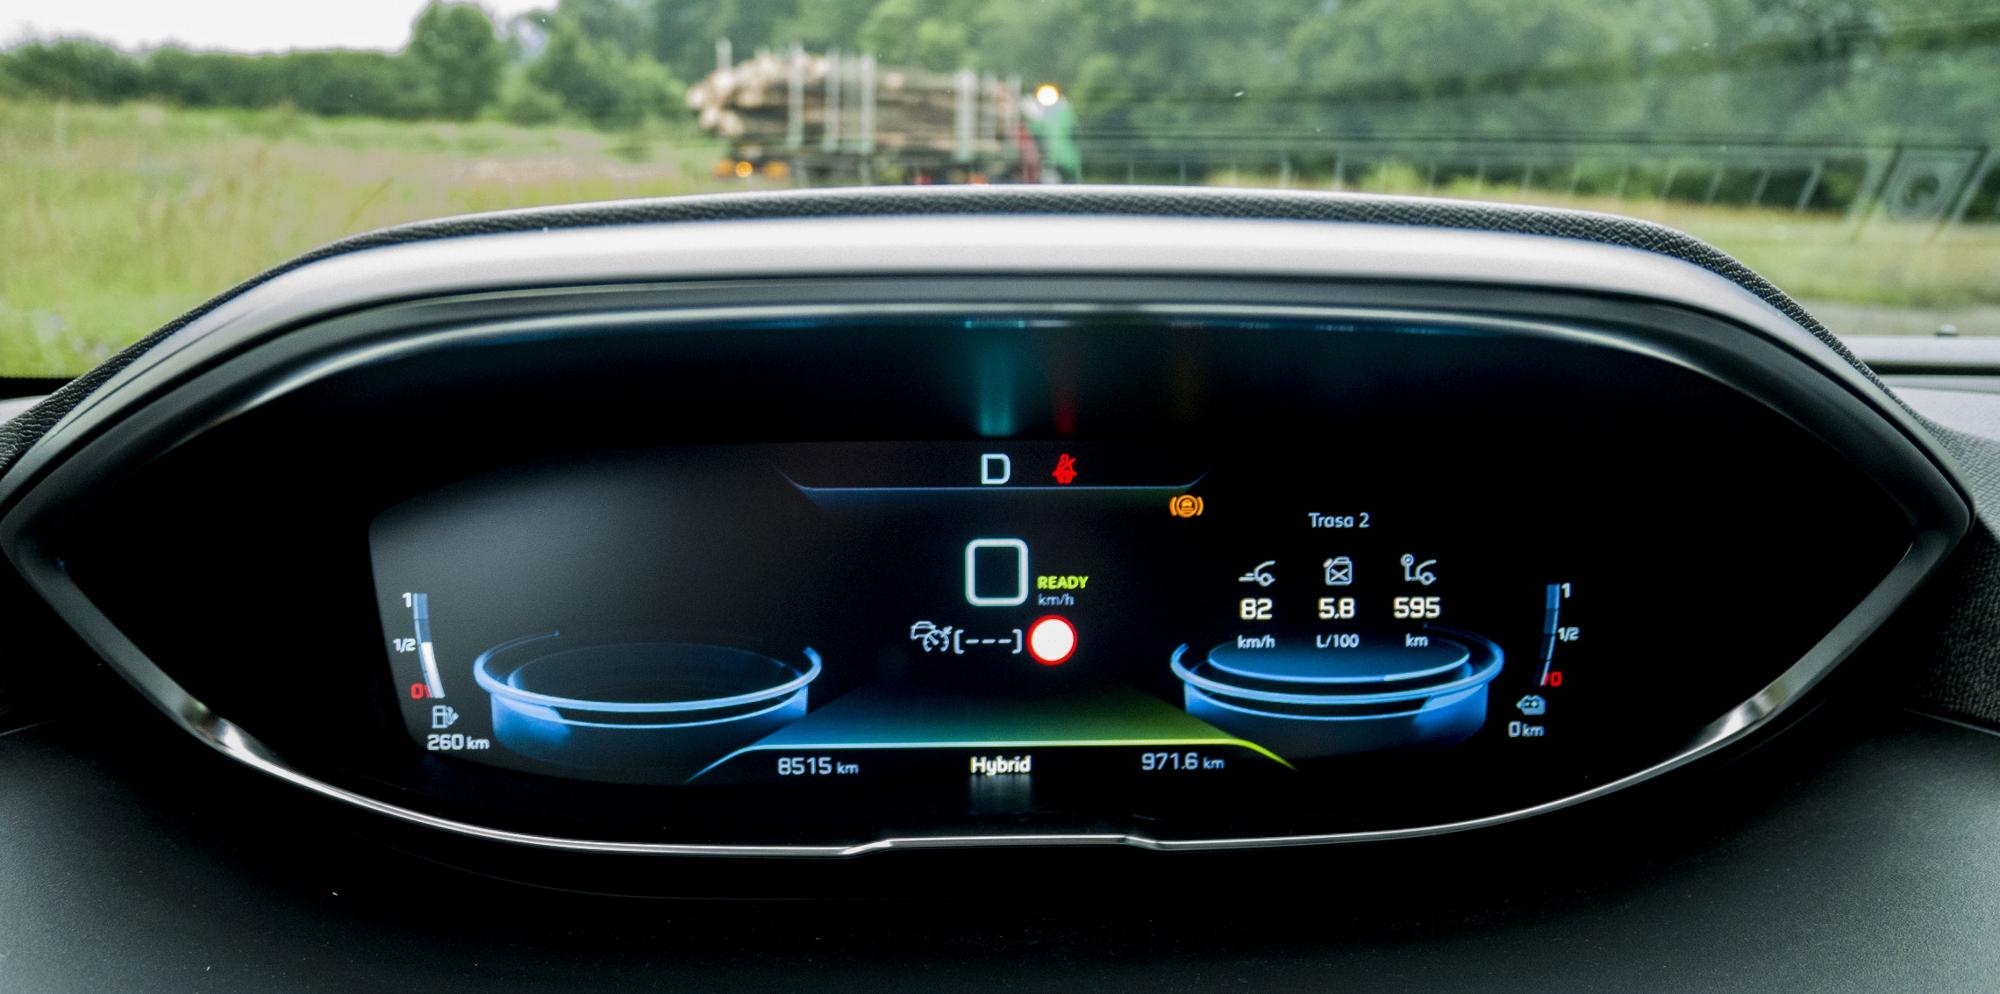 Test: Peugeot 3008 posúva schopnosti plug in hybridov JgQA11g2pm peugeot-3008-hybrid4-5